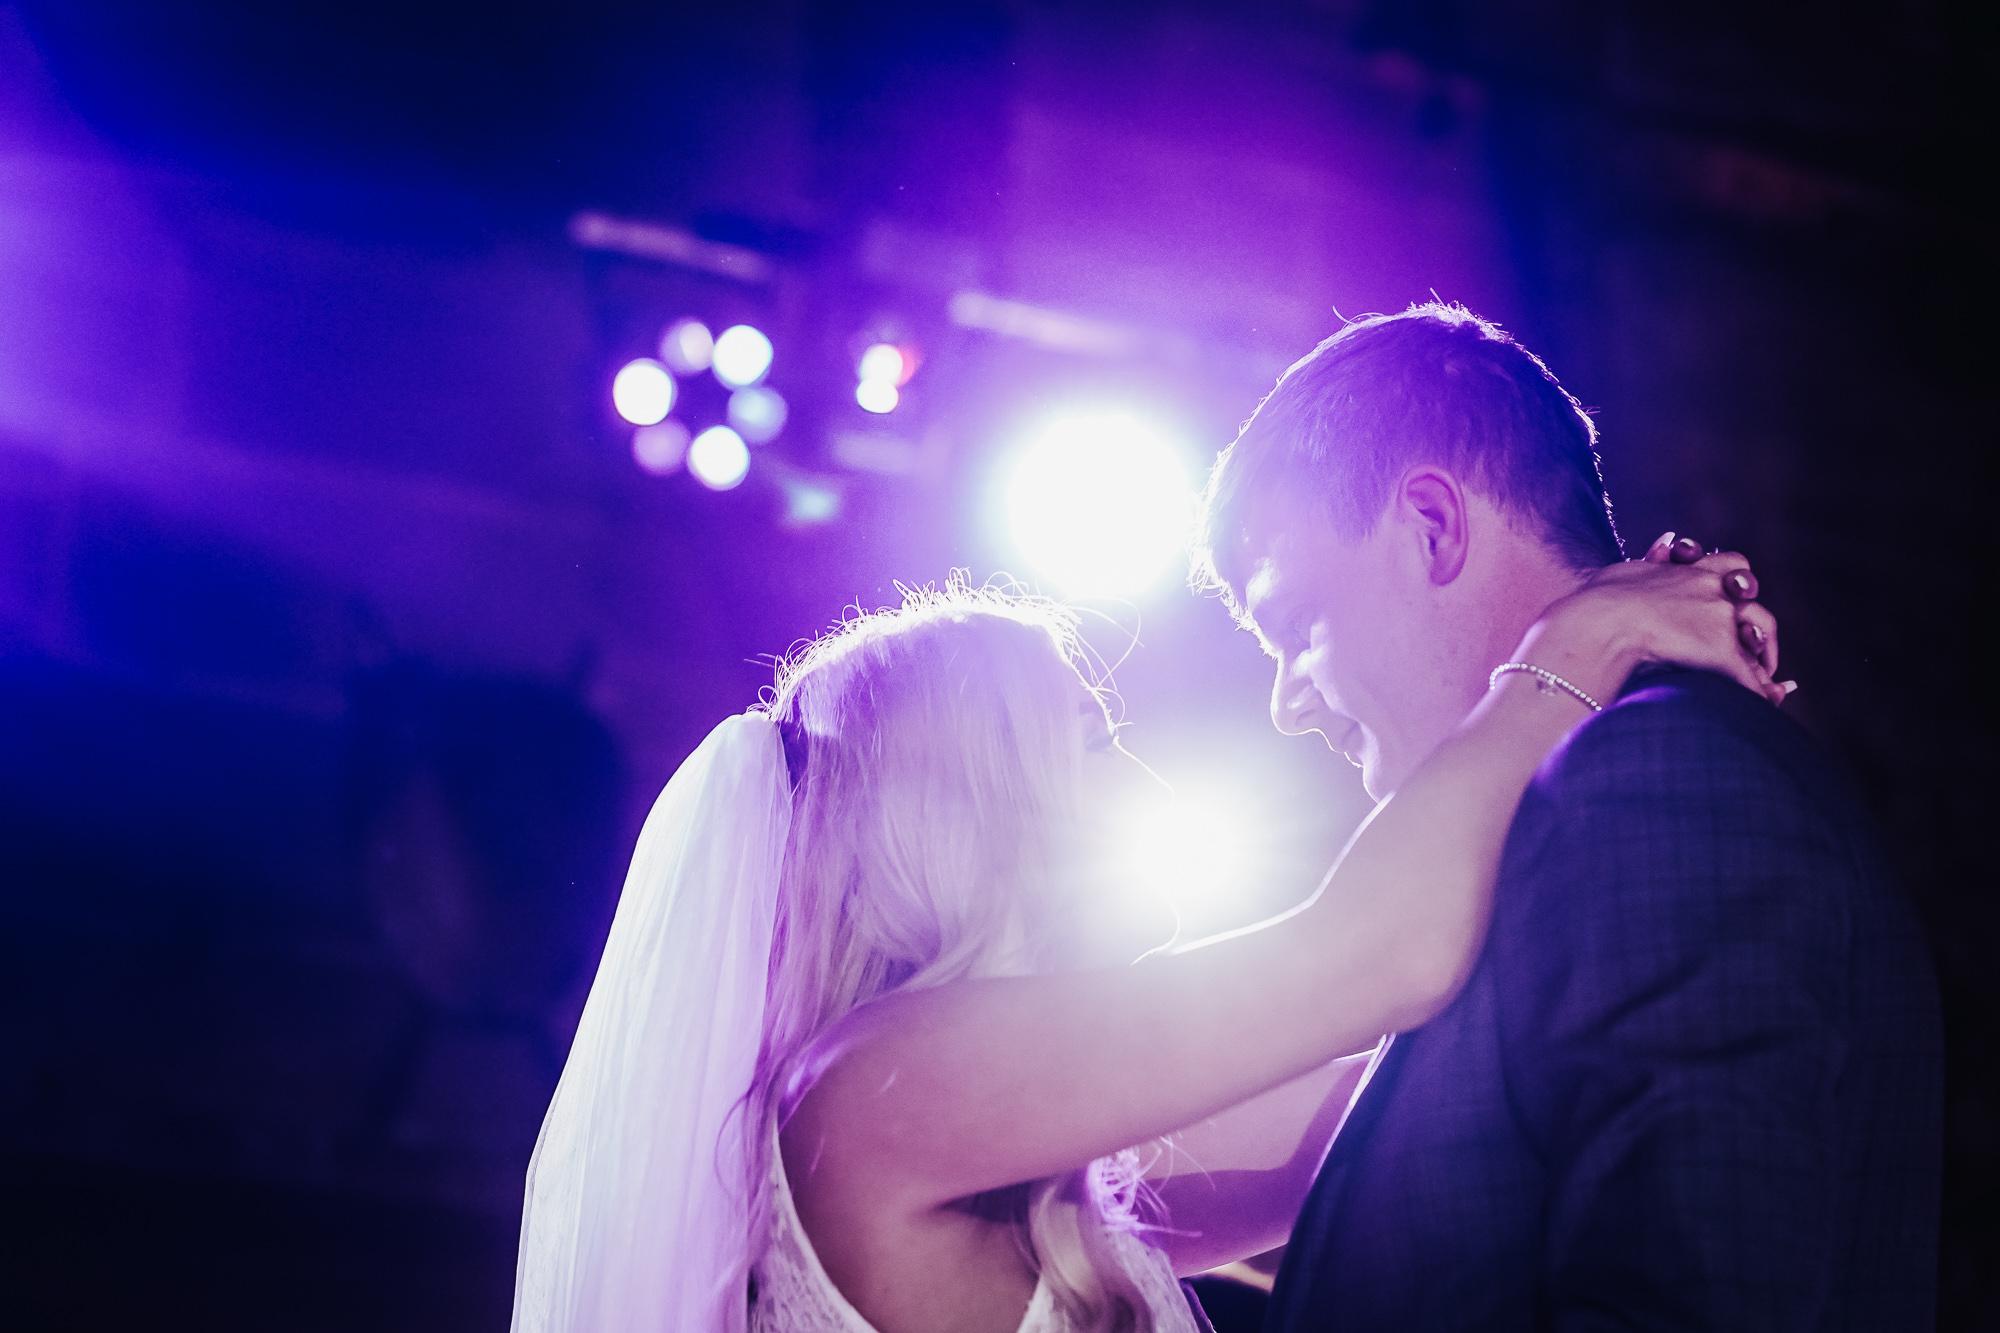 Peckforton Castle wedding photography cheshire wedding photographer (54 of 57).jpg